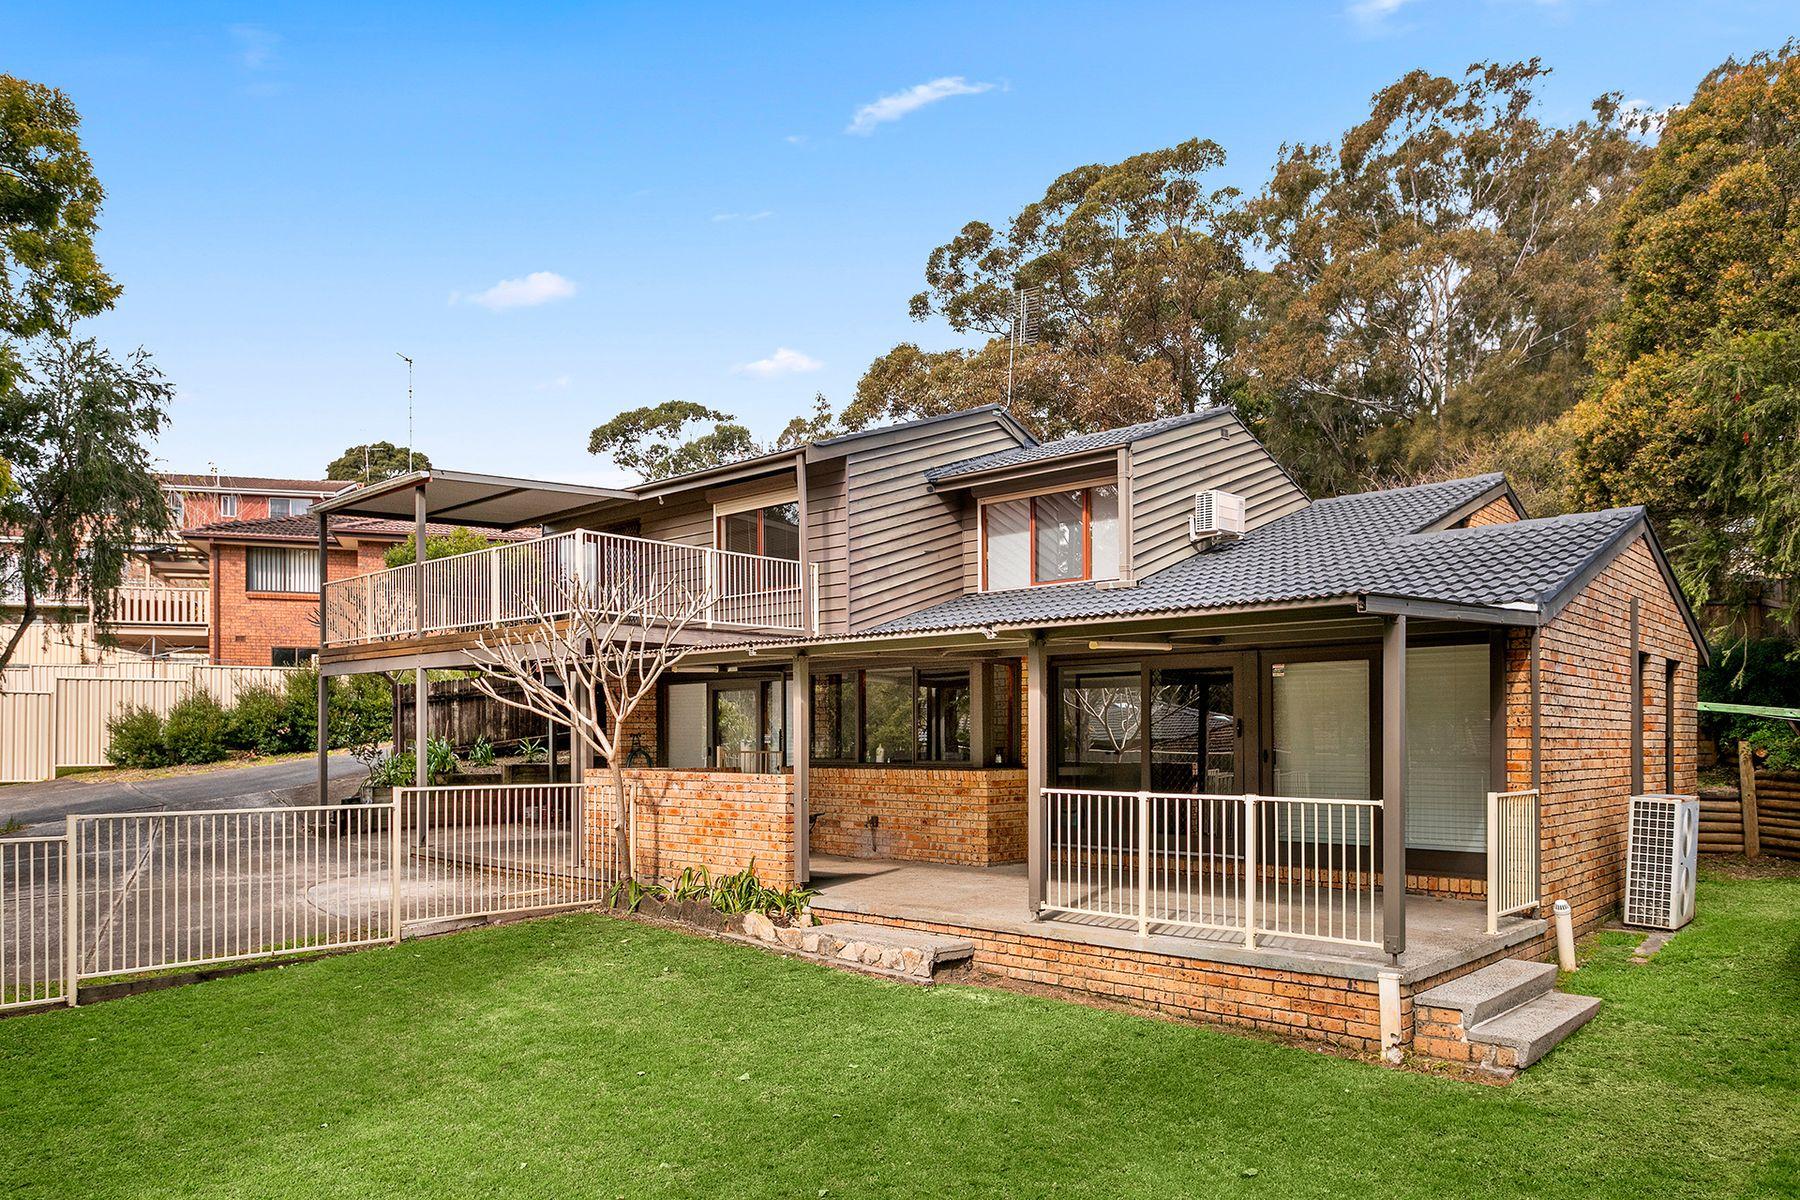 13 Balmaringa Close, Cordeaux Heights, NSW 2526